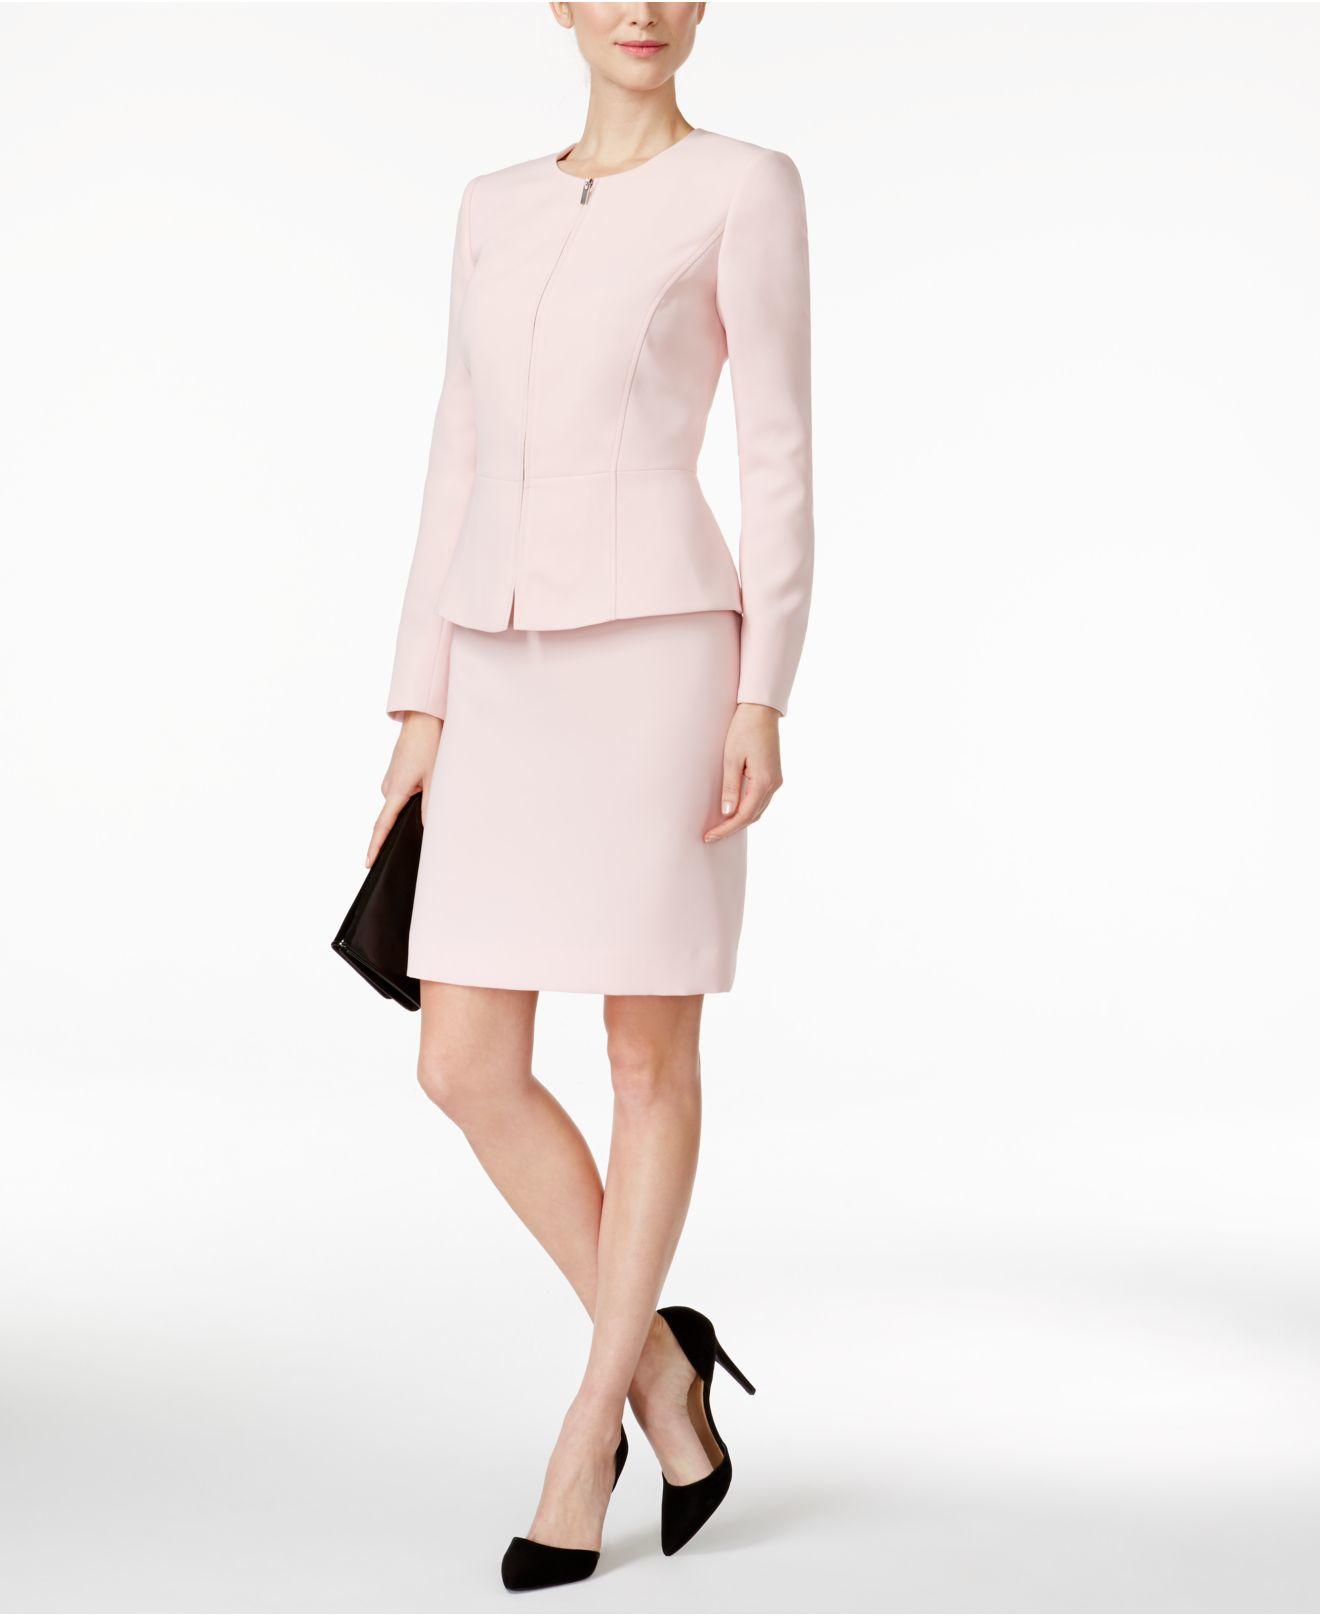 52ed8485b13d Tahari Skirt Suit Petite